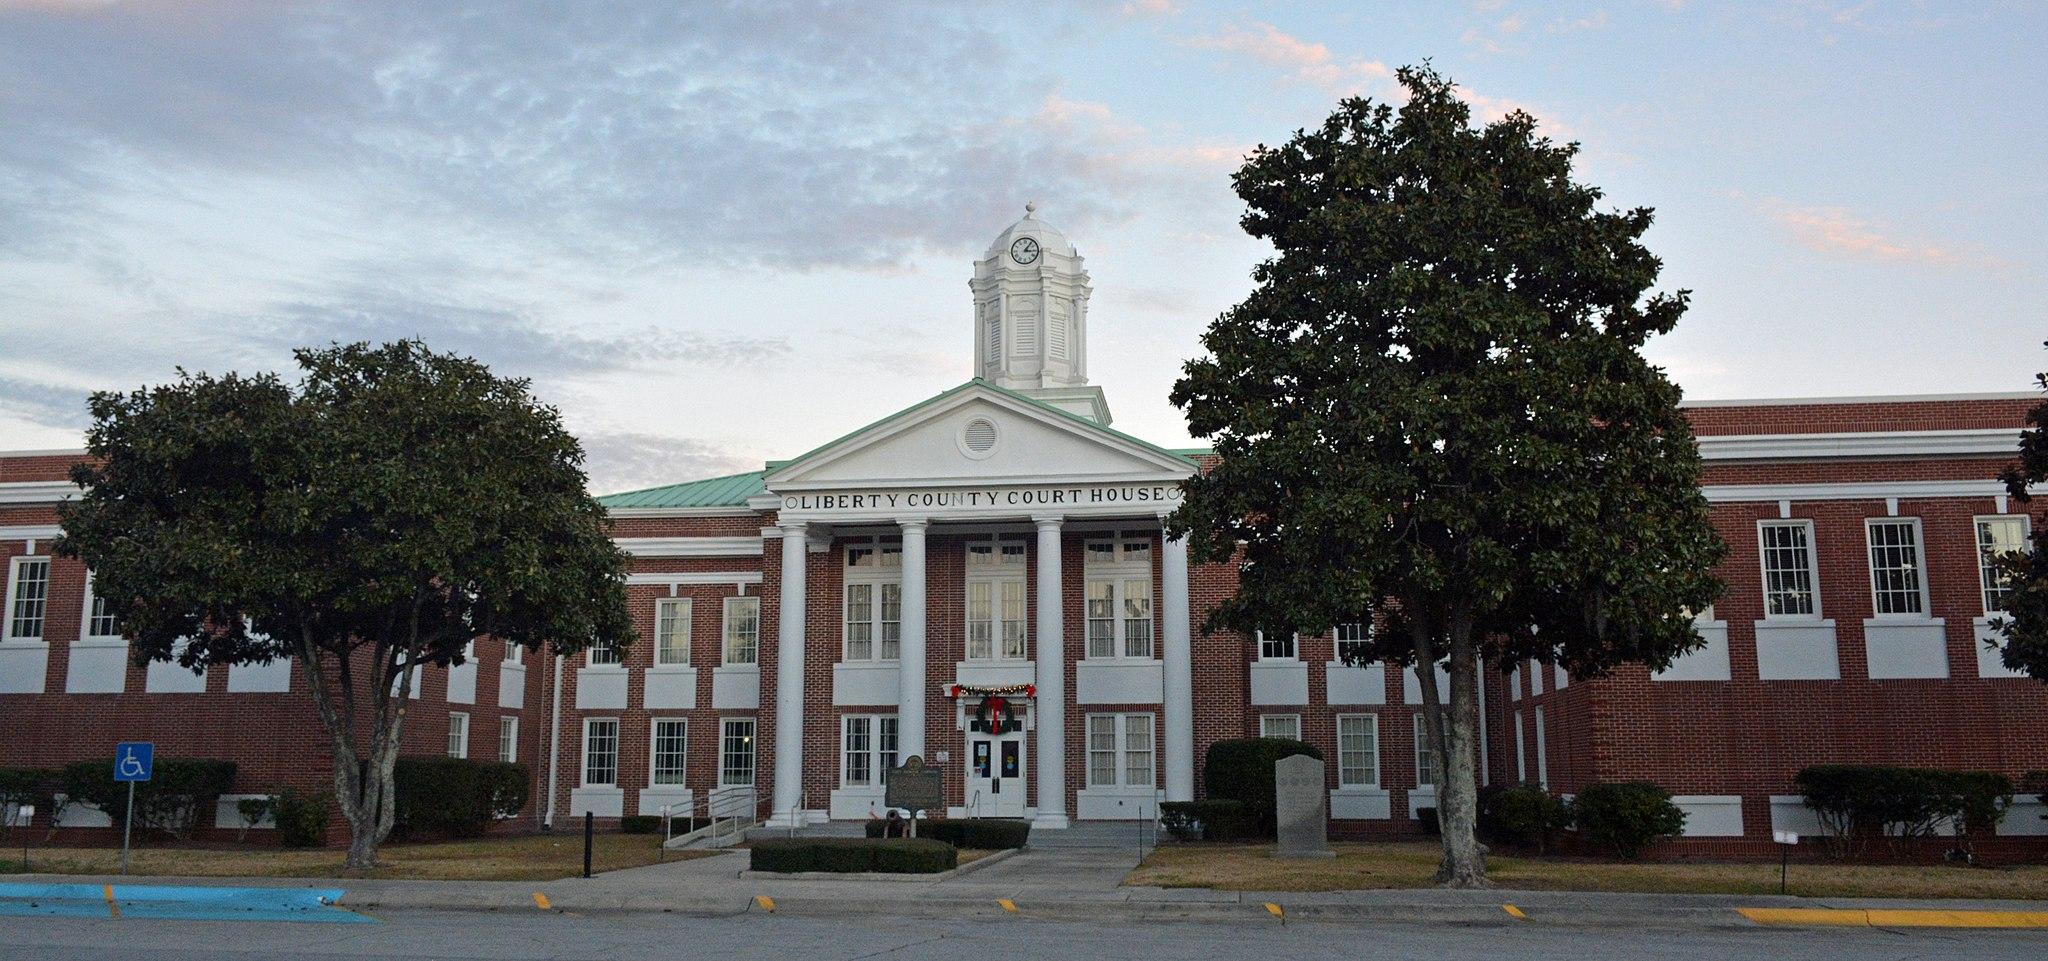 Liberty County Courthouse, back - Hinesville GA USA